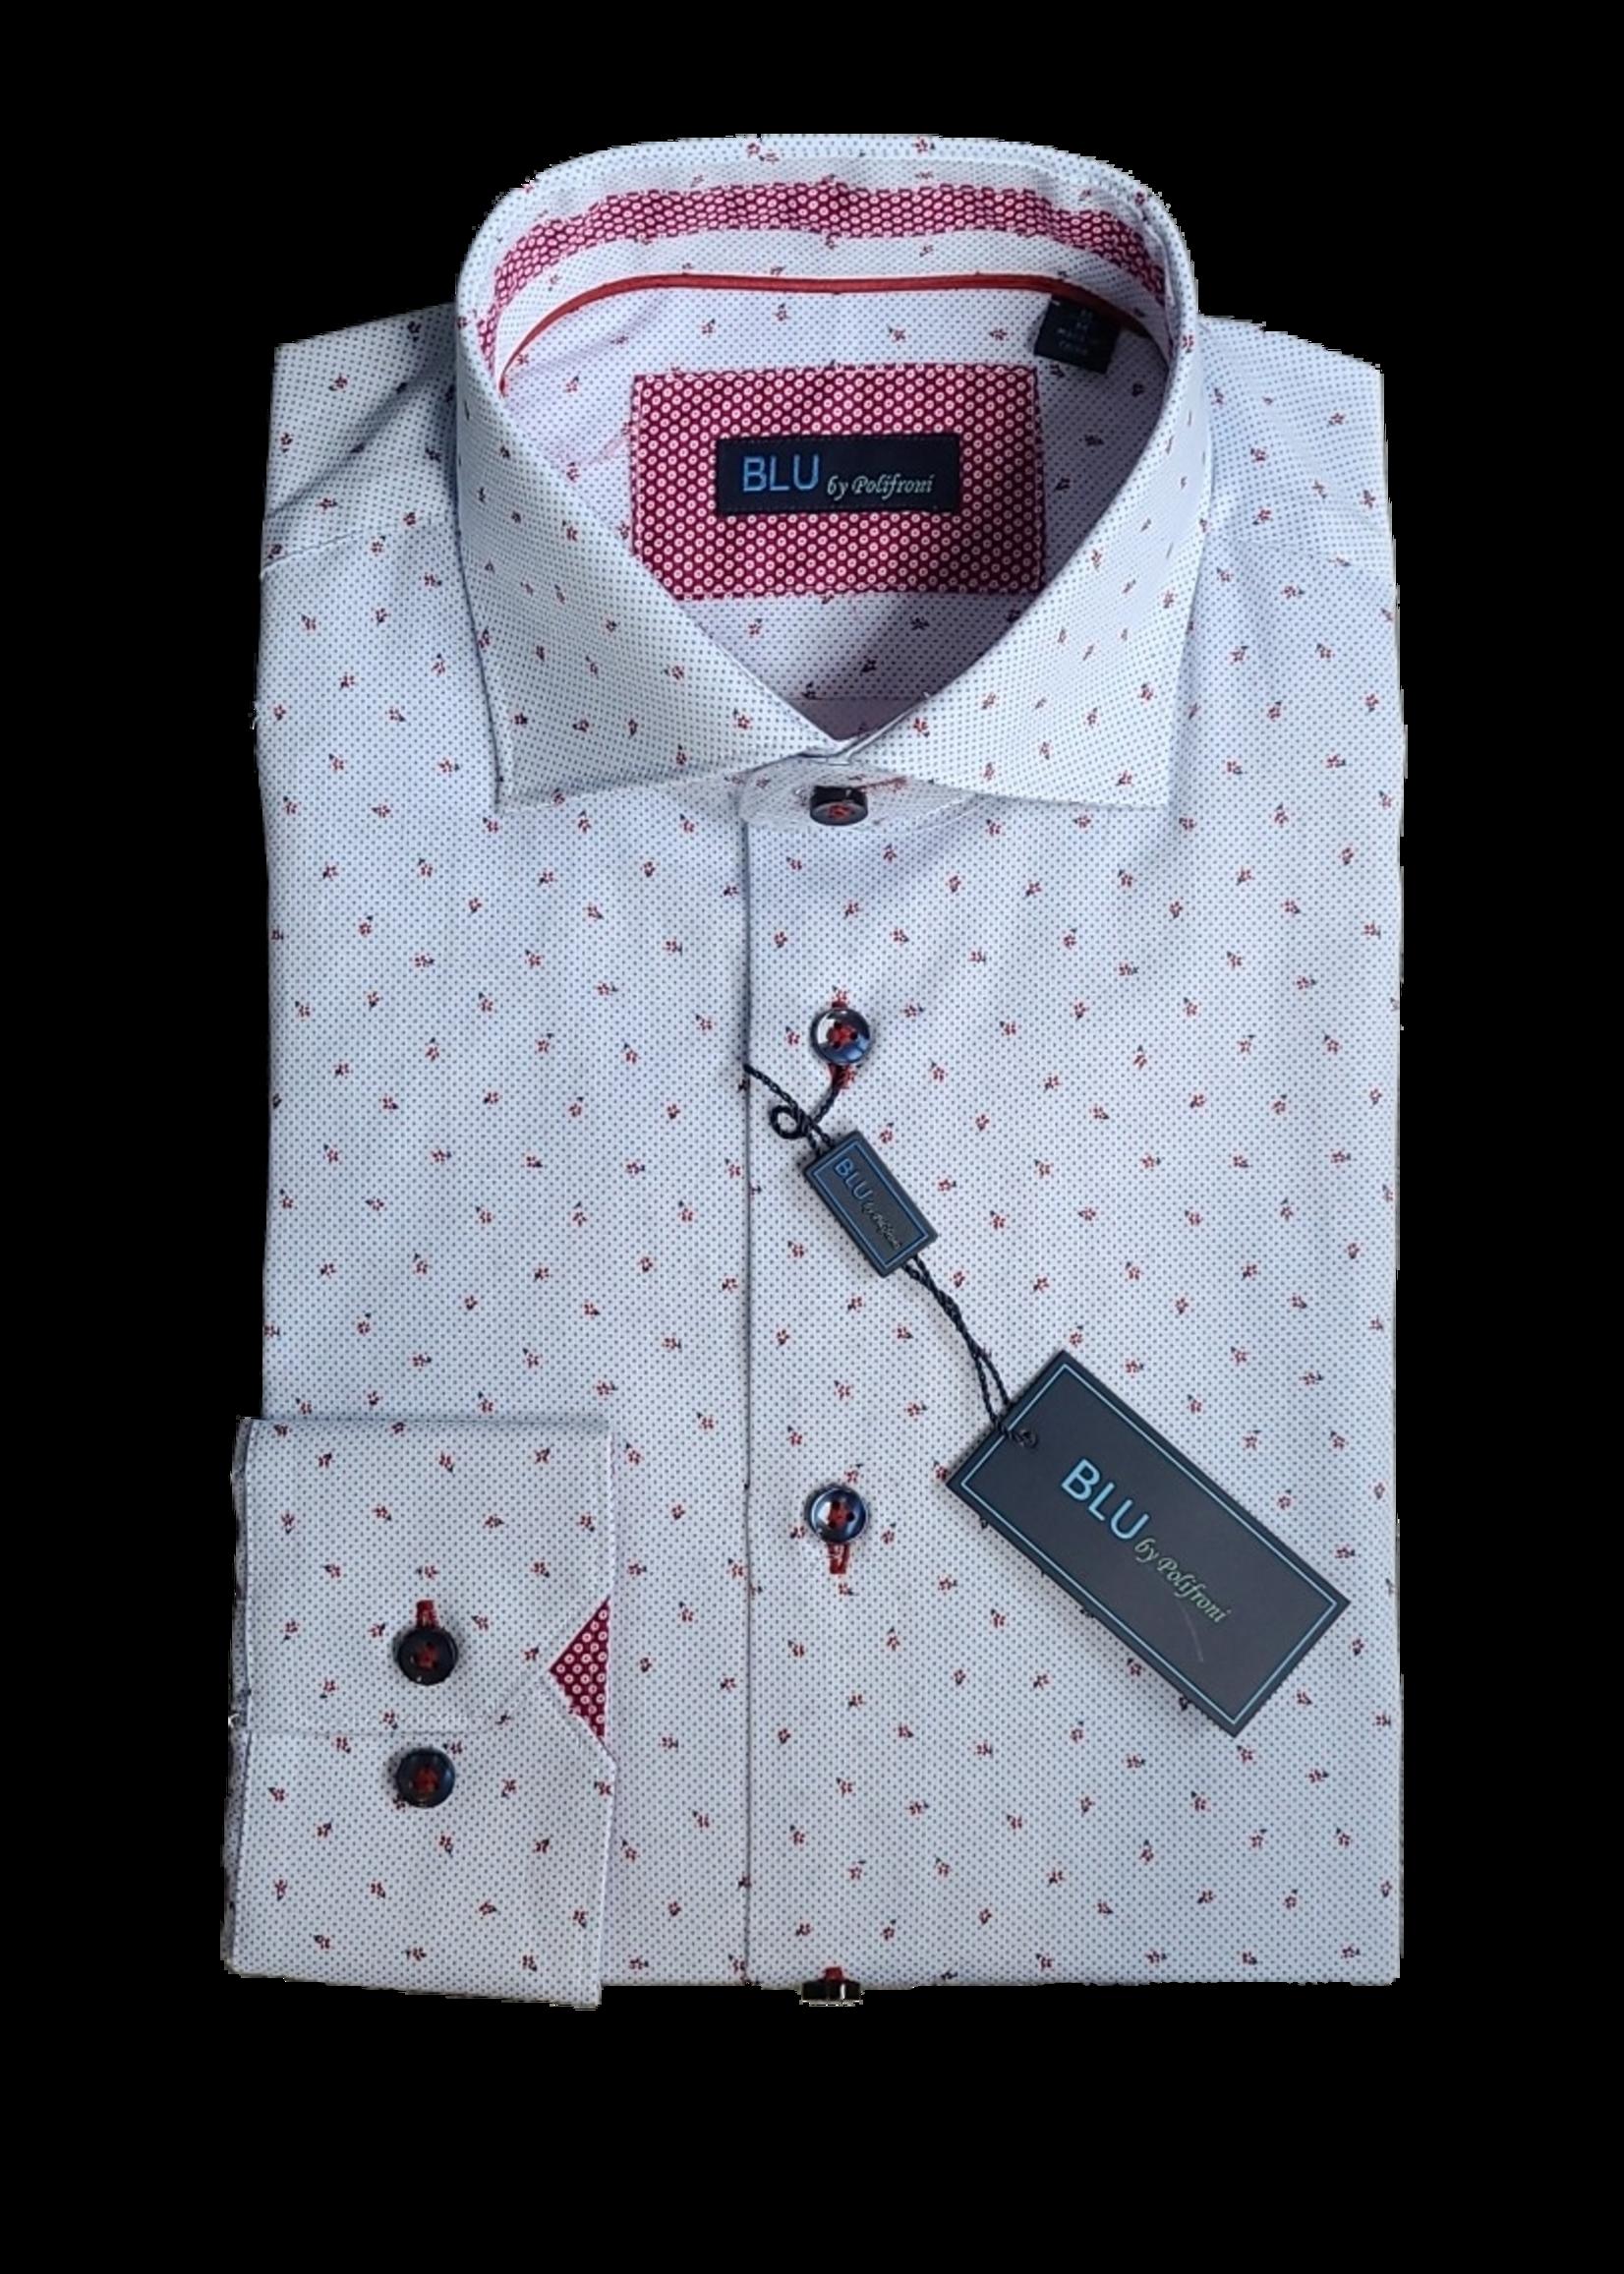 Blu Polifroni BLU B2149525 Shirt